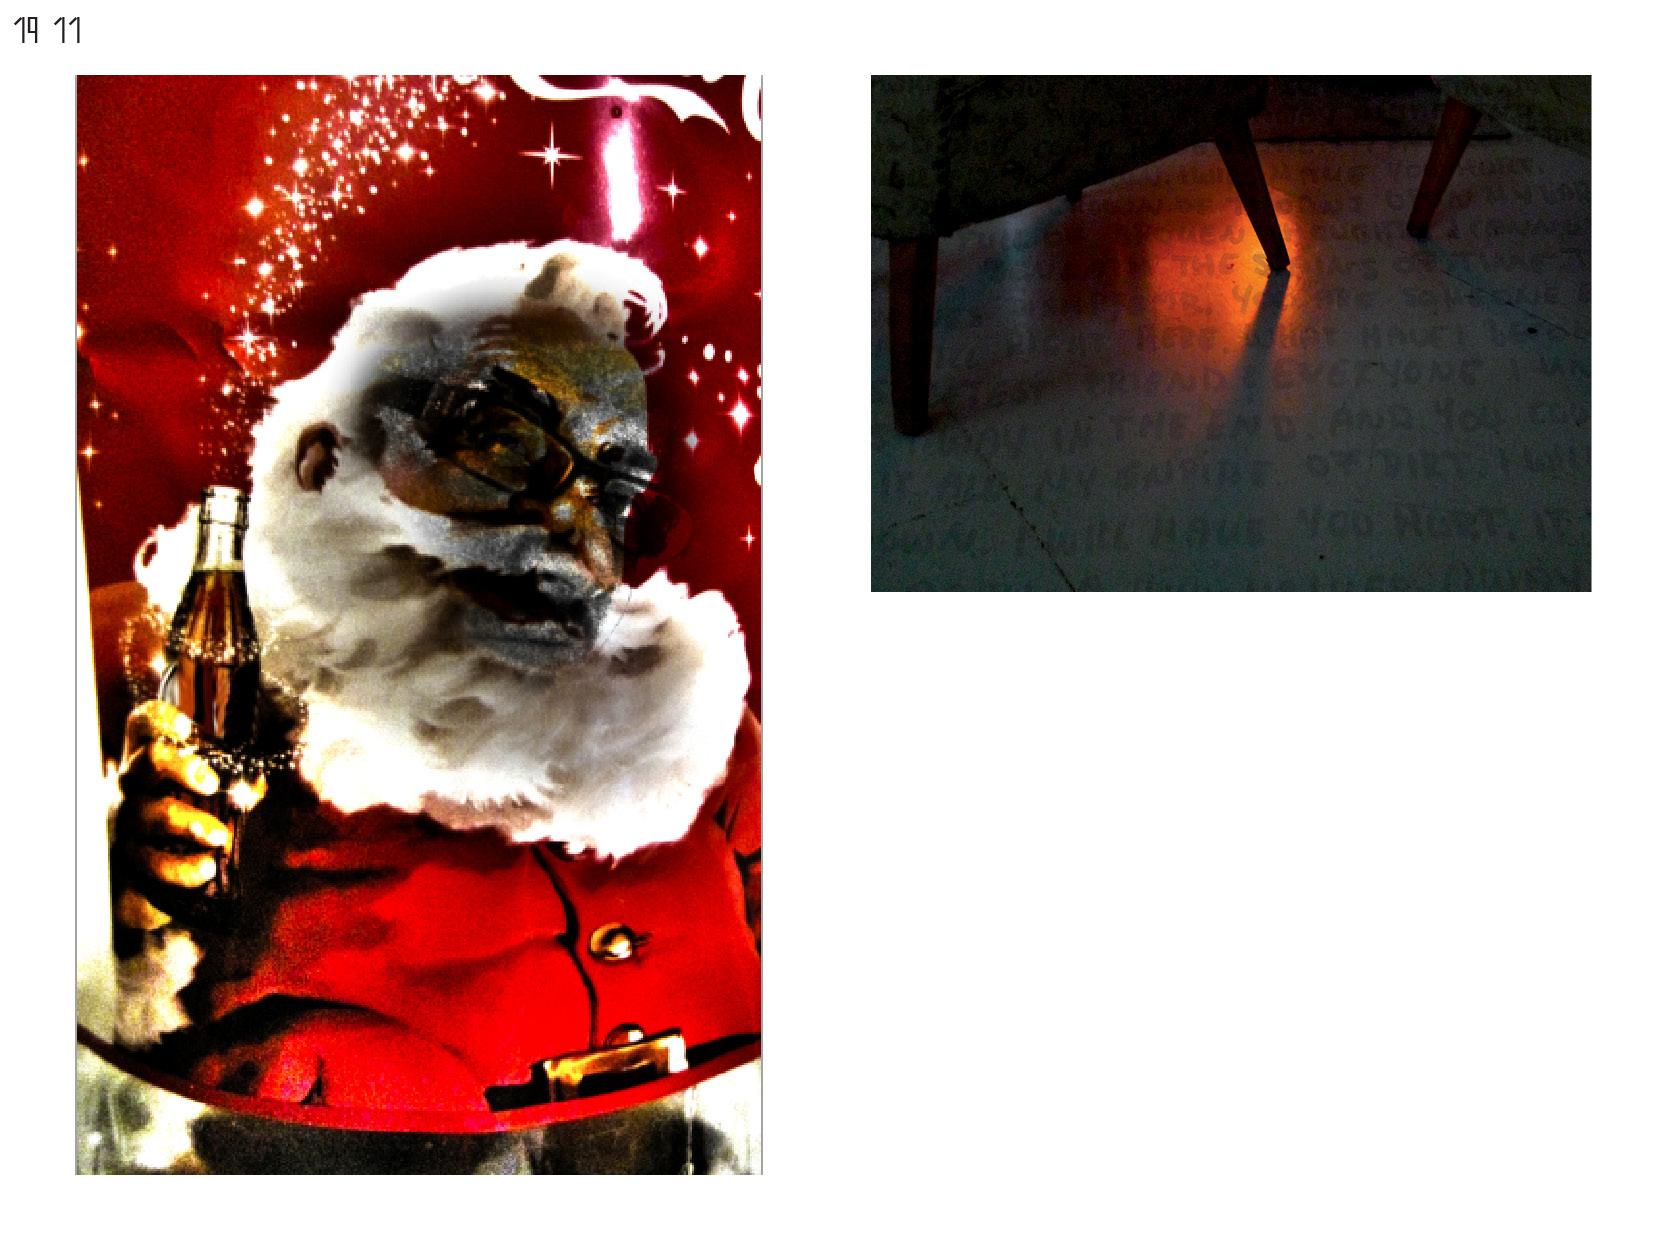 Gerrit-Schweiger-Dialog-Städte-Paris-Berlin-Jessica-Blank-Experiment-Fotoserie-Tagebuch-visuelle-Kommunikation-34